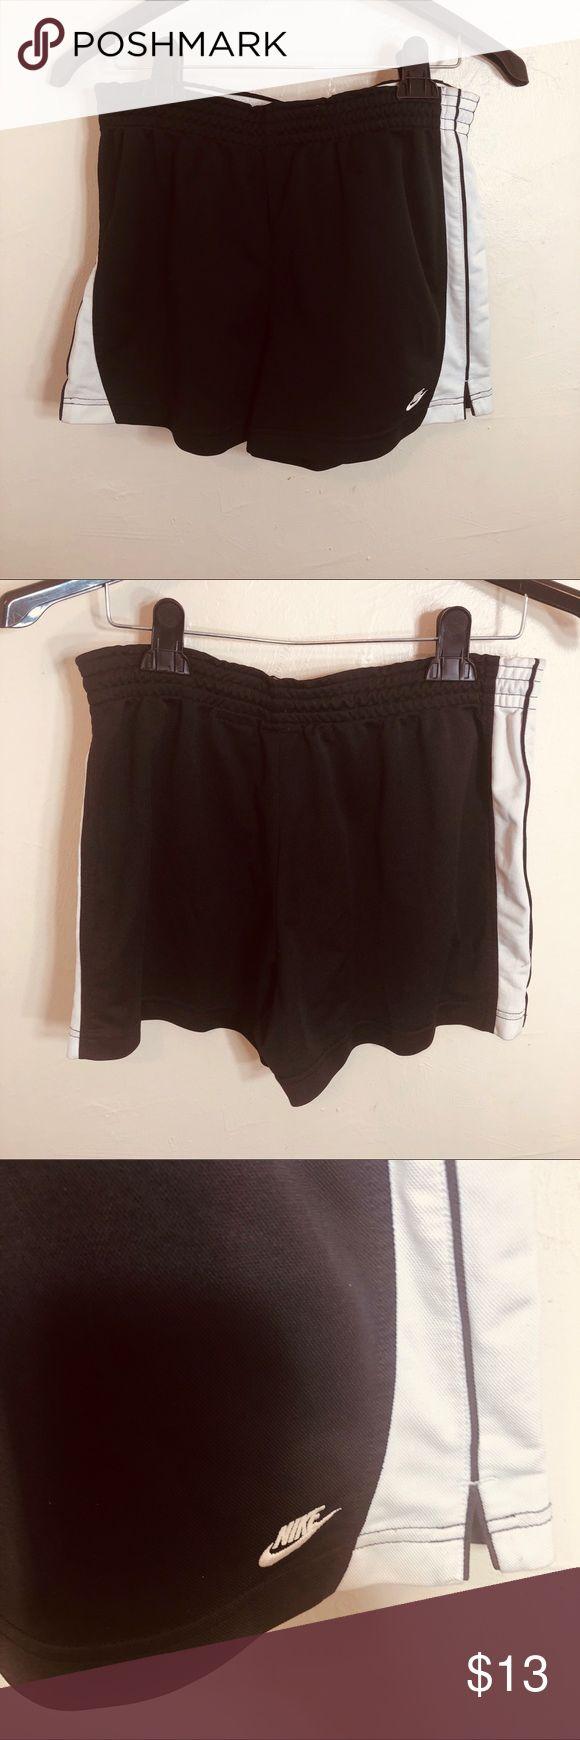 Nike Jordans Athletic Schwarz-Weiß-Shorts Nike Athletic Schwarz-Weiß-Shorts G …   – My Posh Picks